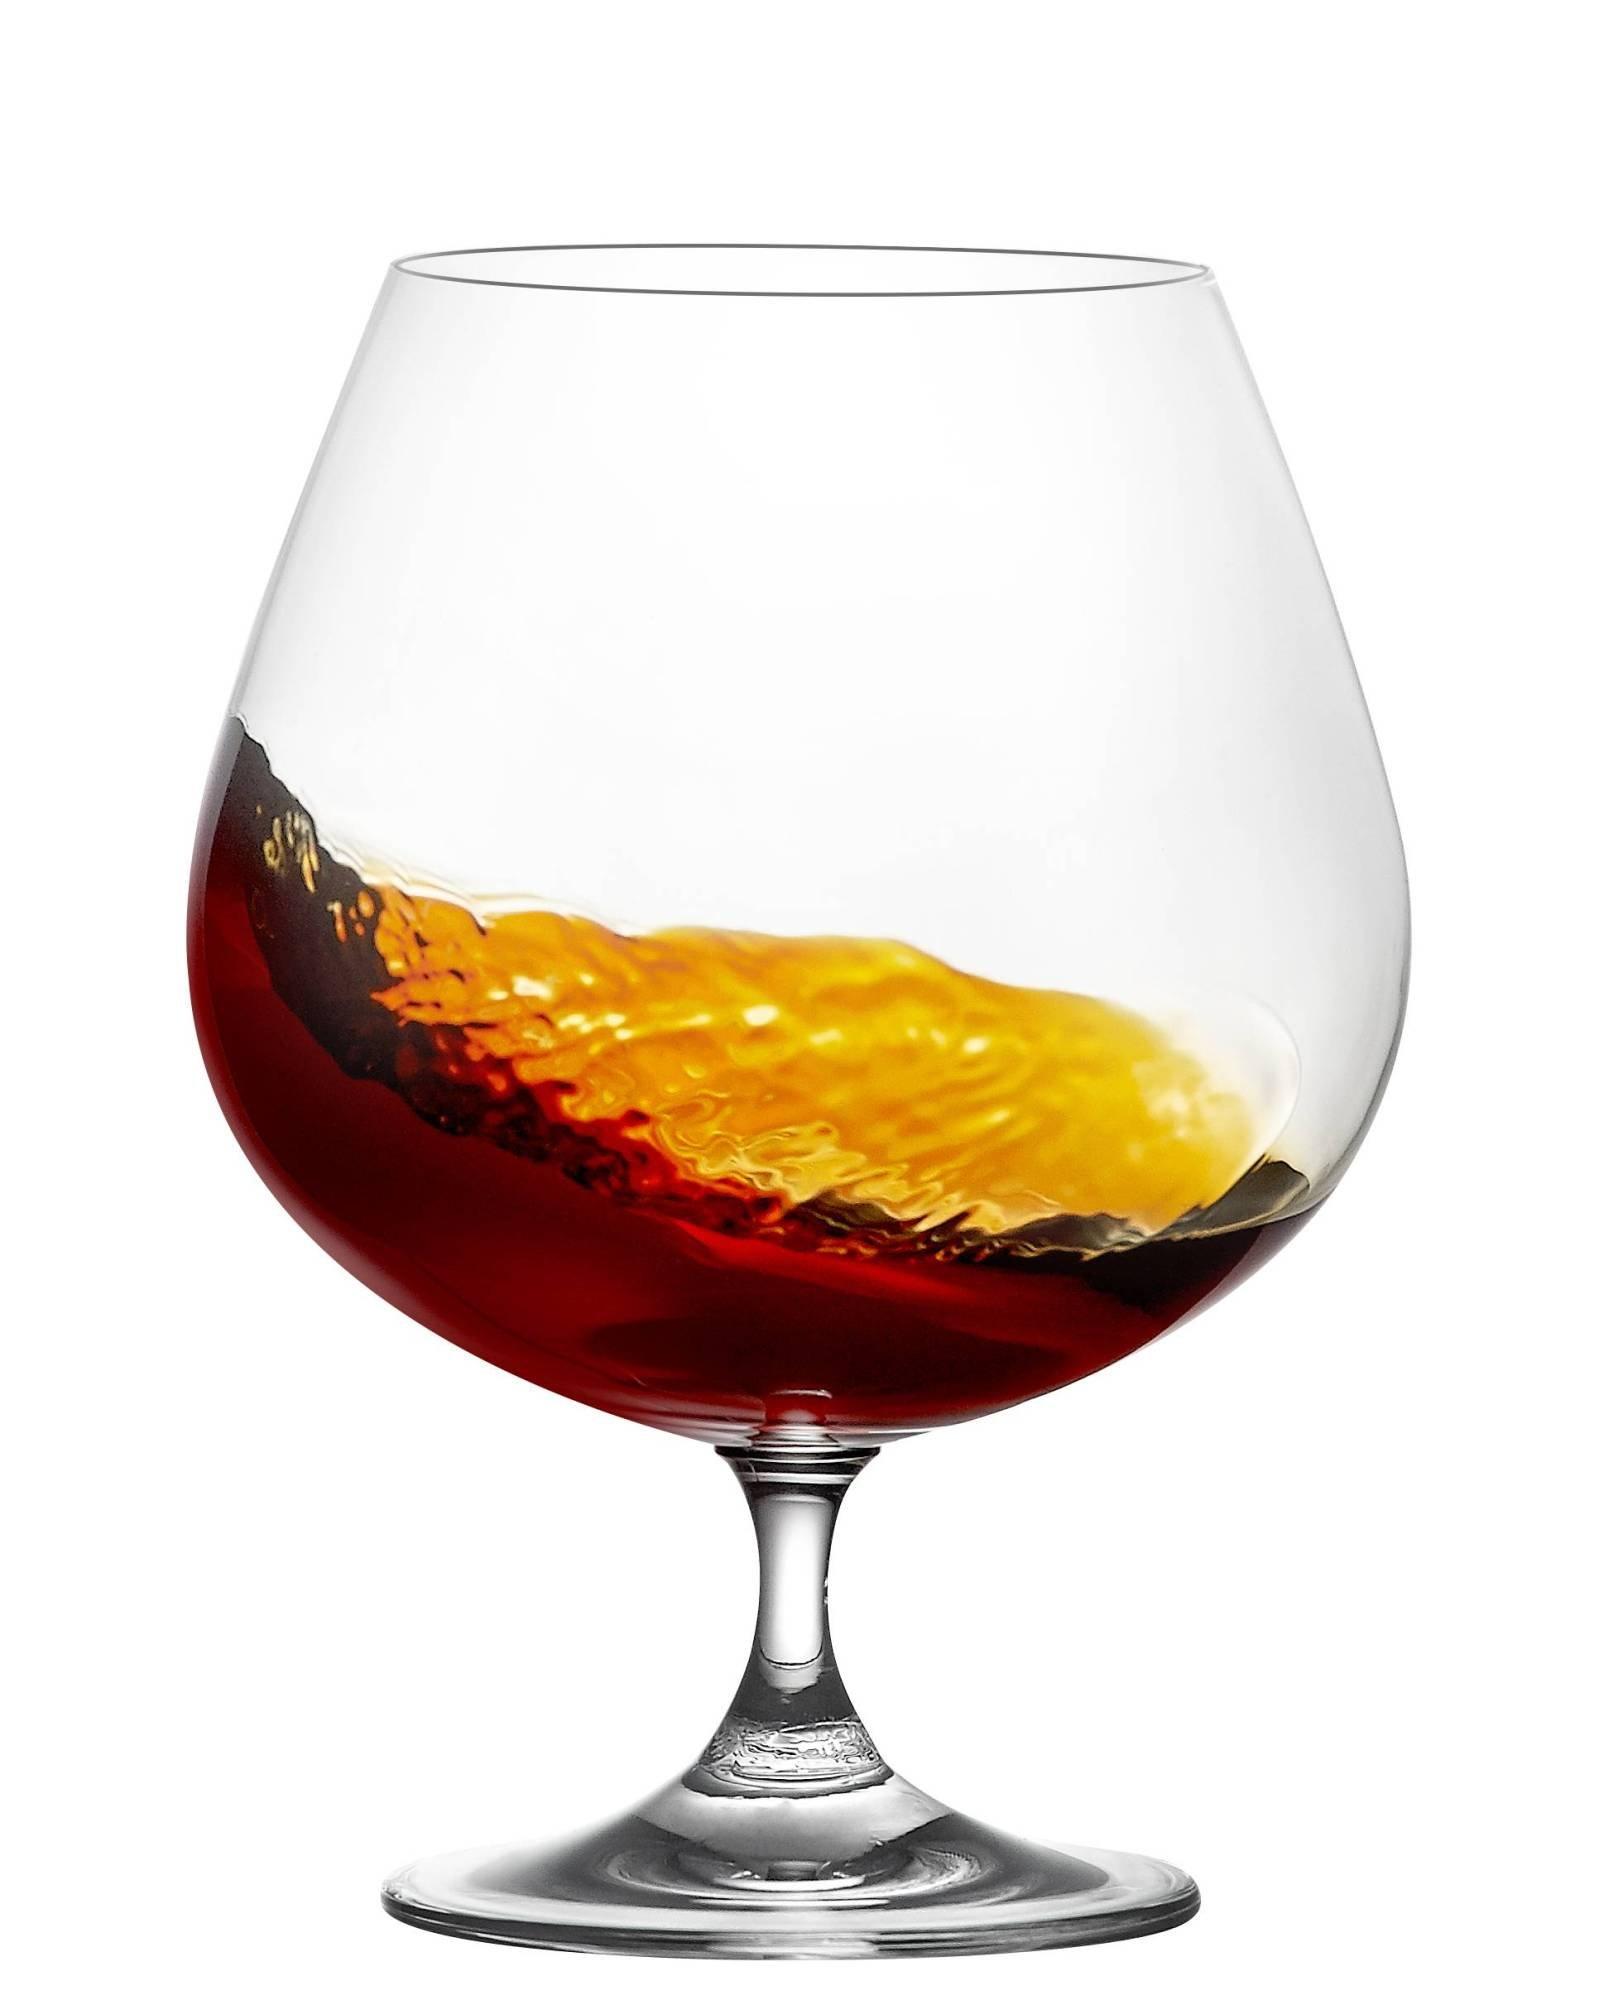 RONA Magnum Brandy Glass 25 oz.